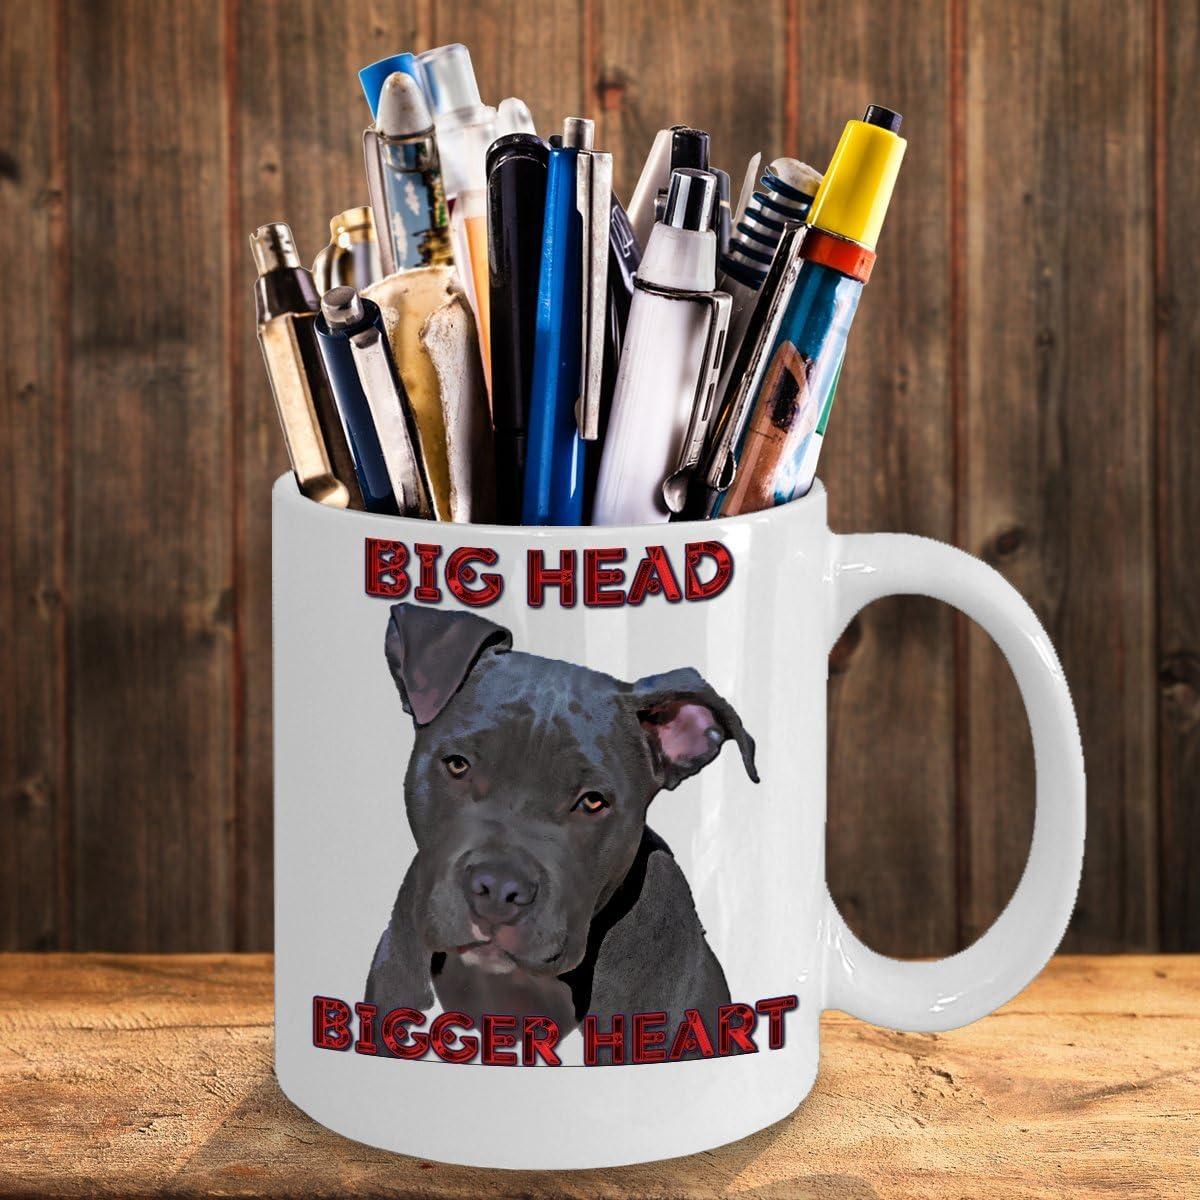 Big Head Bigger Heart Pitbull Lovers Mug